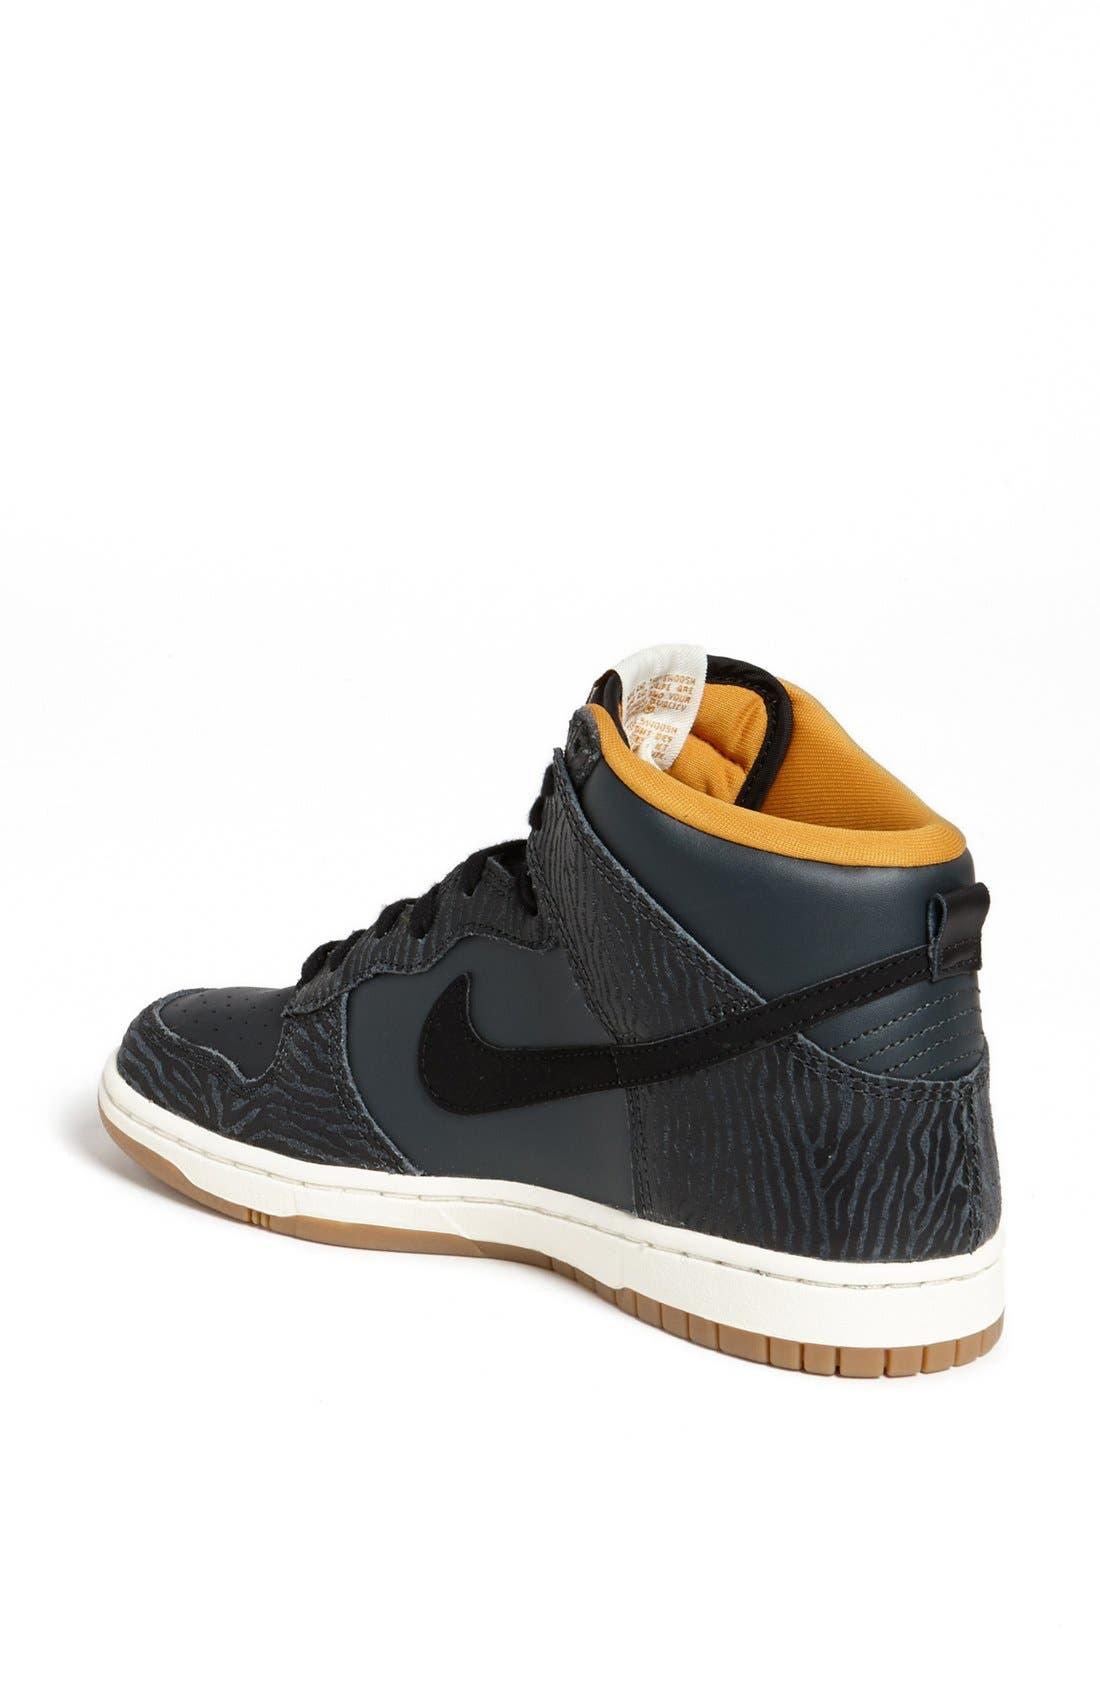 Alternate Image 2  - Nike 'Dunk Hi - Skinny Print' High Top Basketball Sneaker